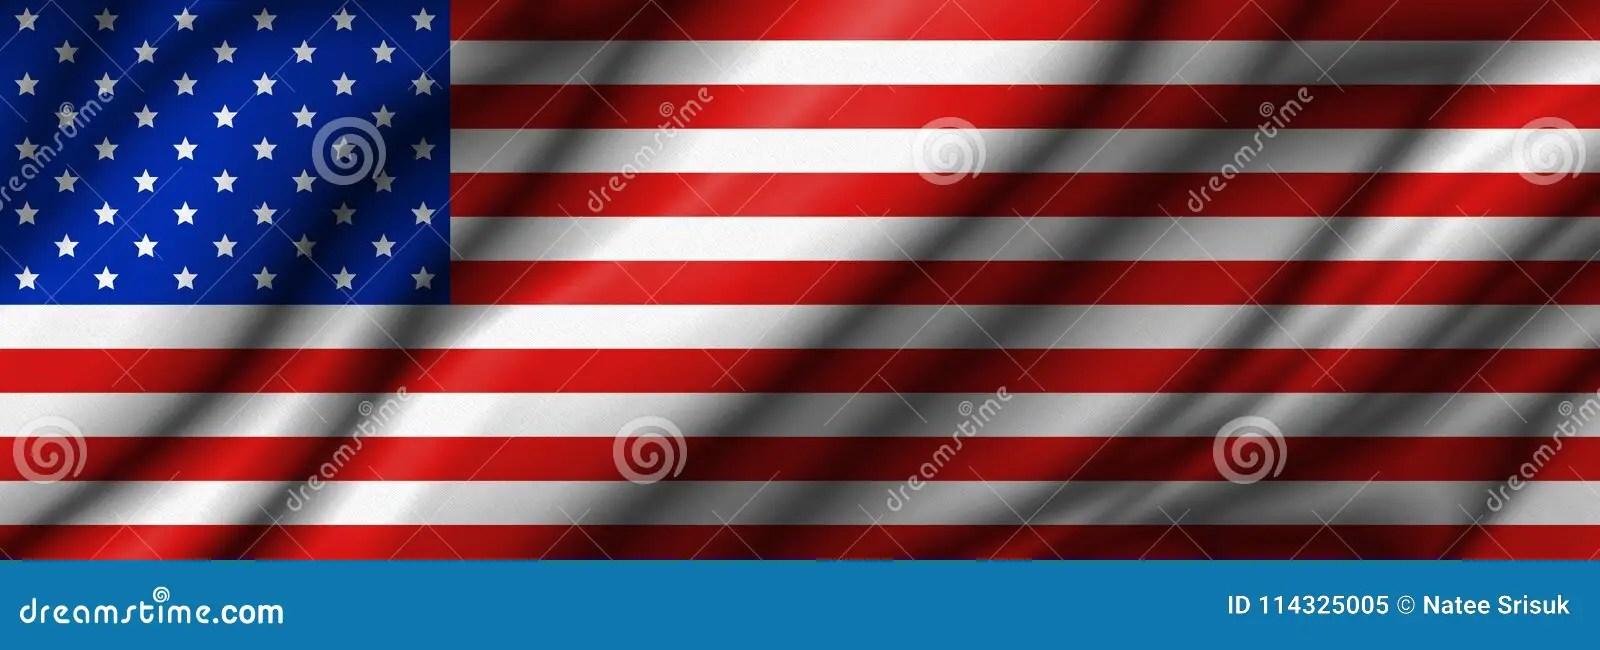 USA Or America Flag Background Stock Illustration - Illustration of